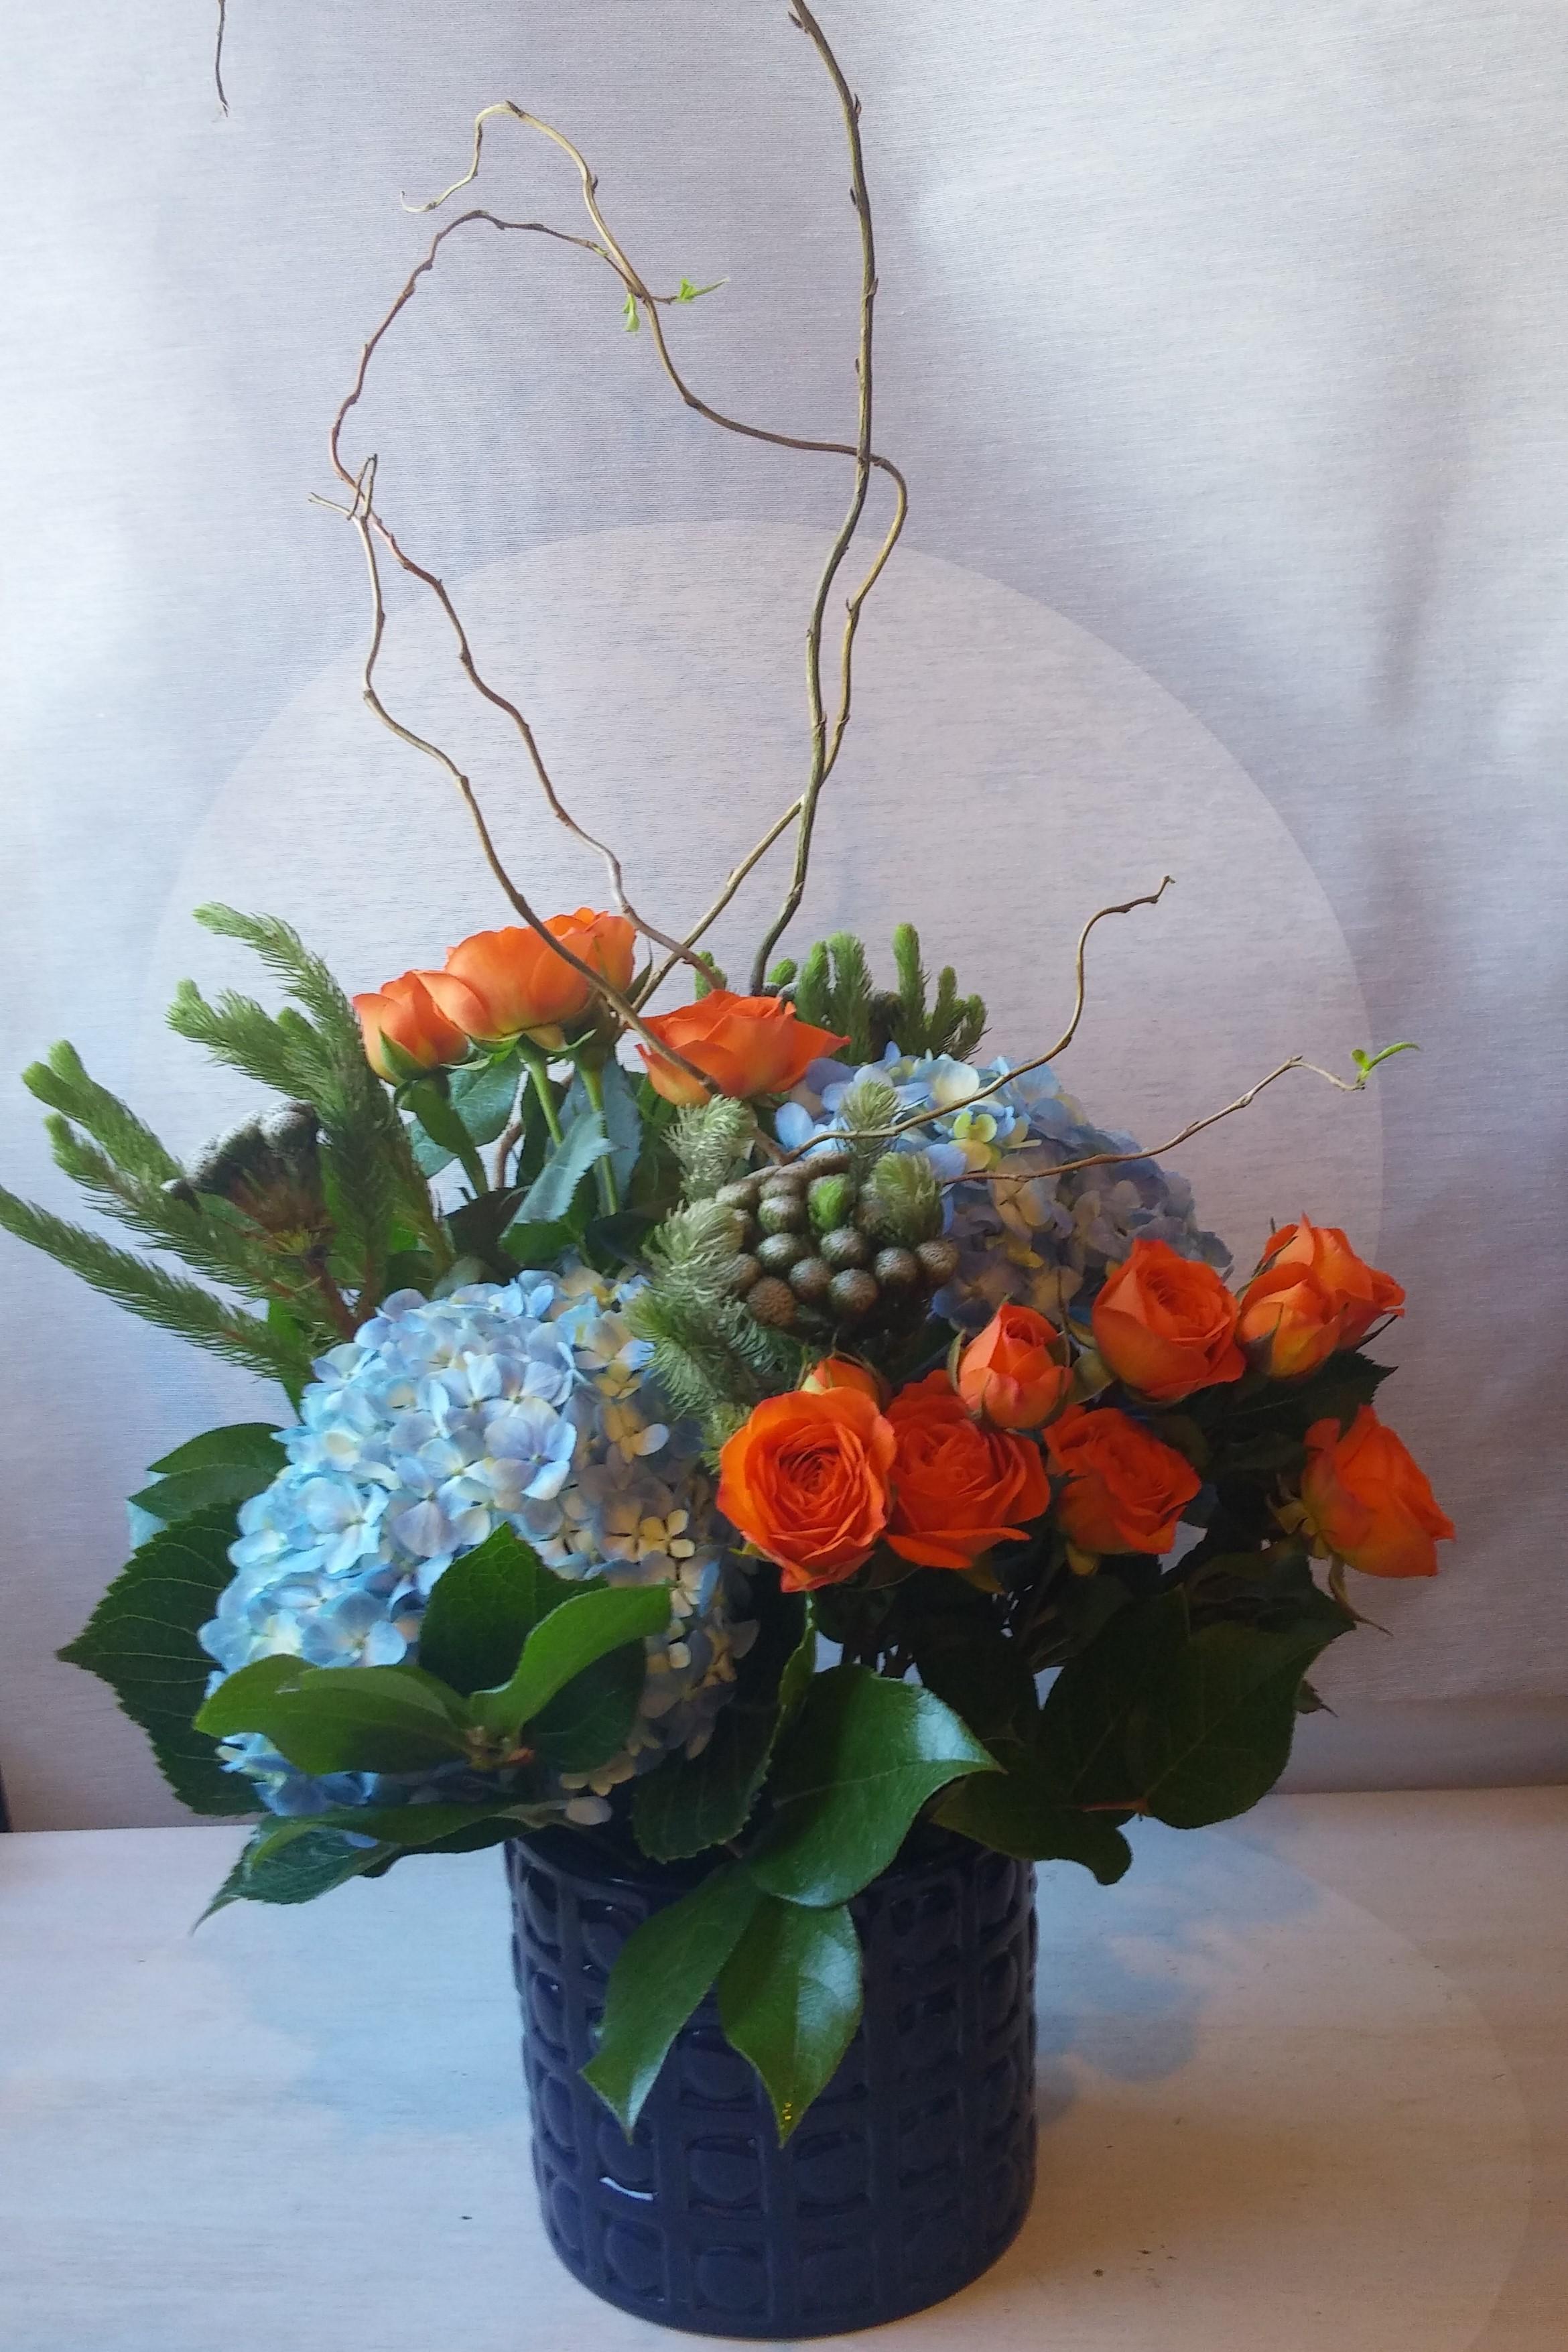 Flower Delivery Blue Hydrangea Floral Delivery Blue And Orange Bright Colored Flowers Birthday Flower Arrangement Orange Roses Luna Vinca